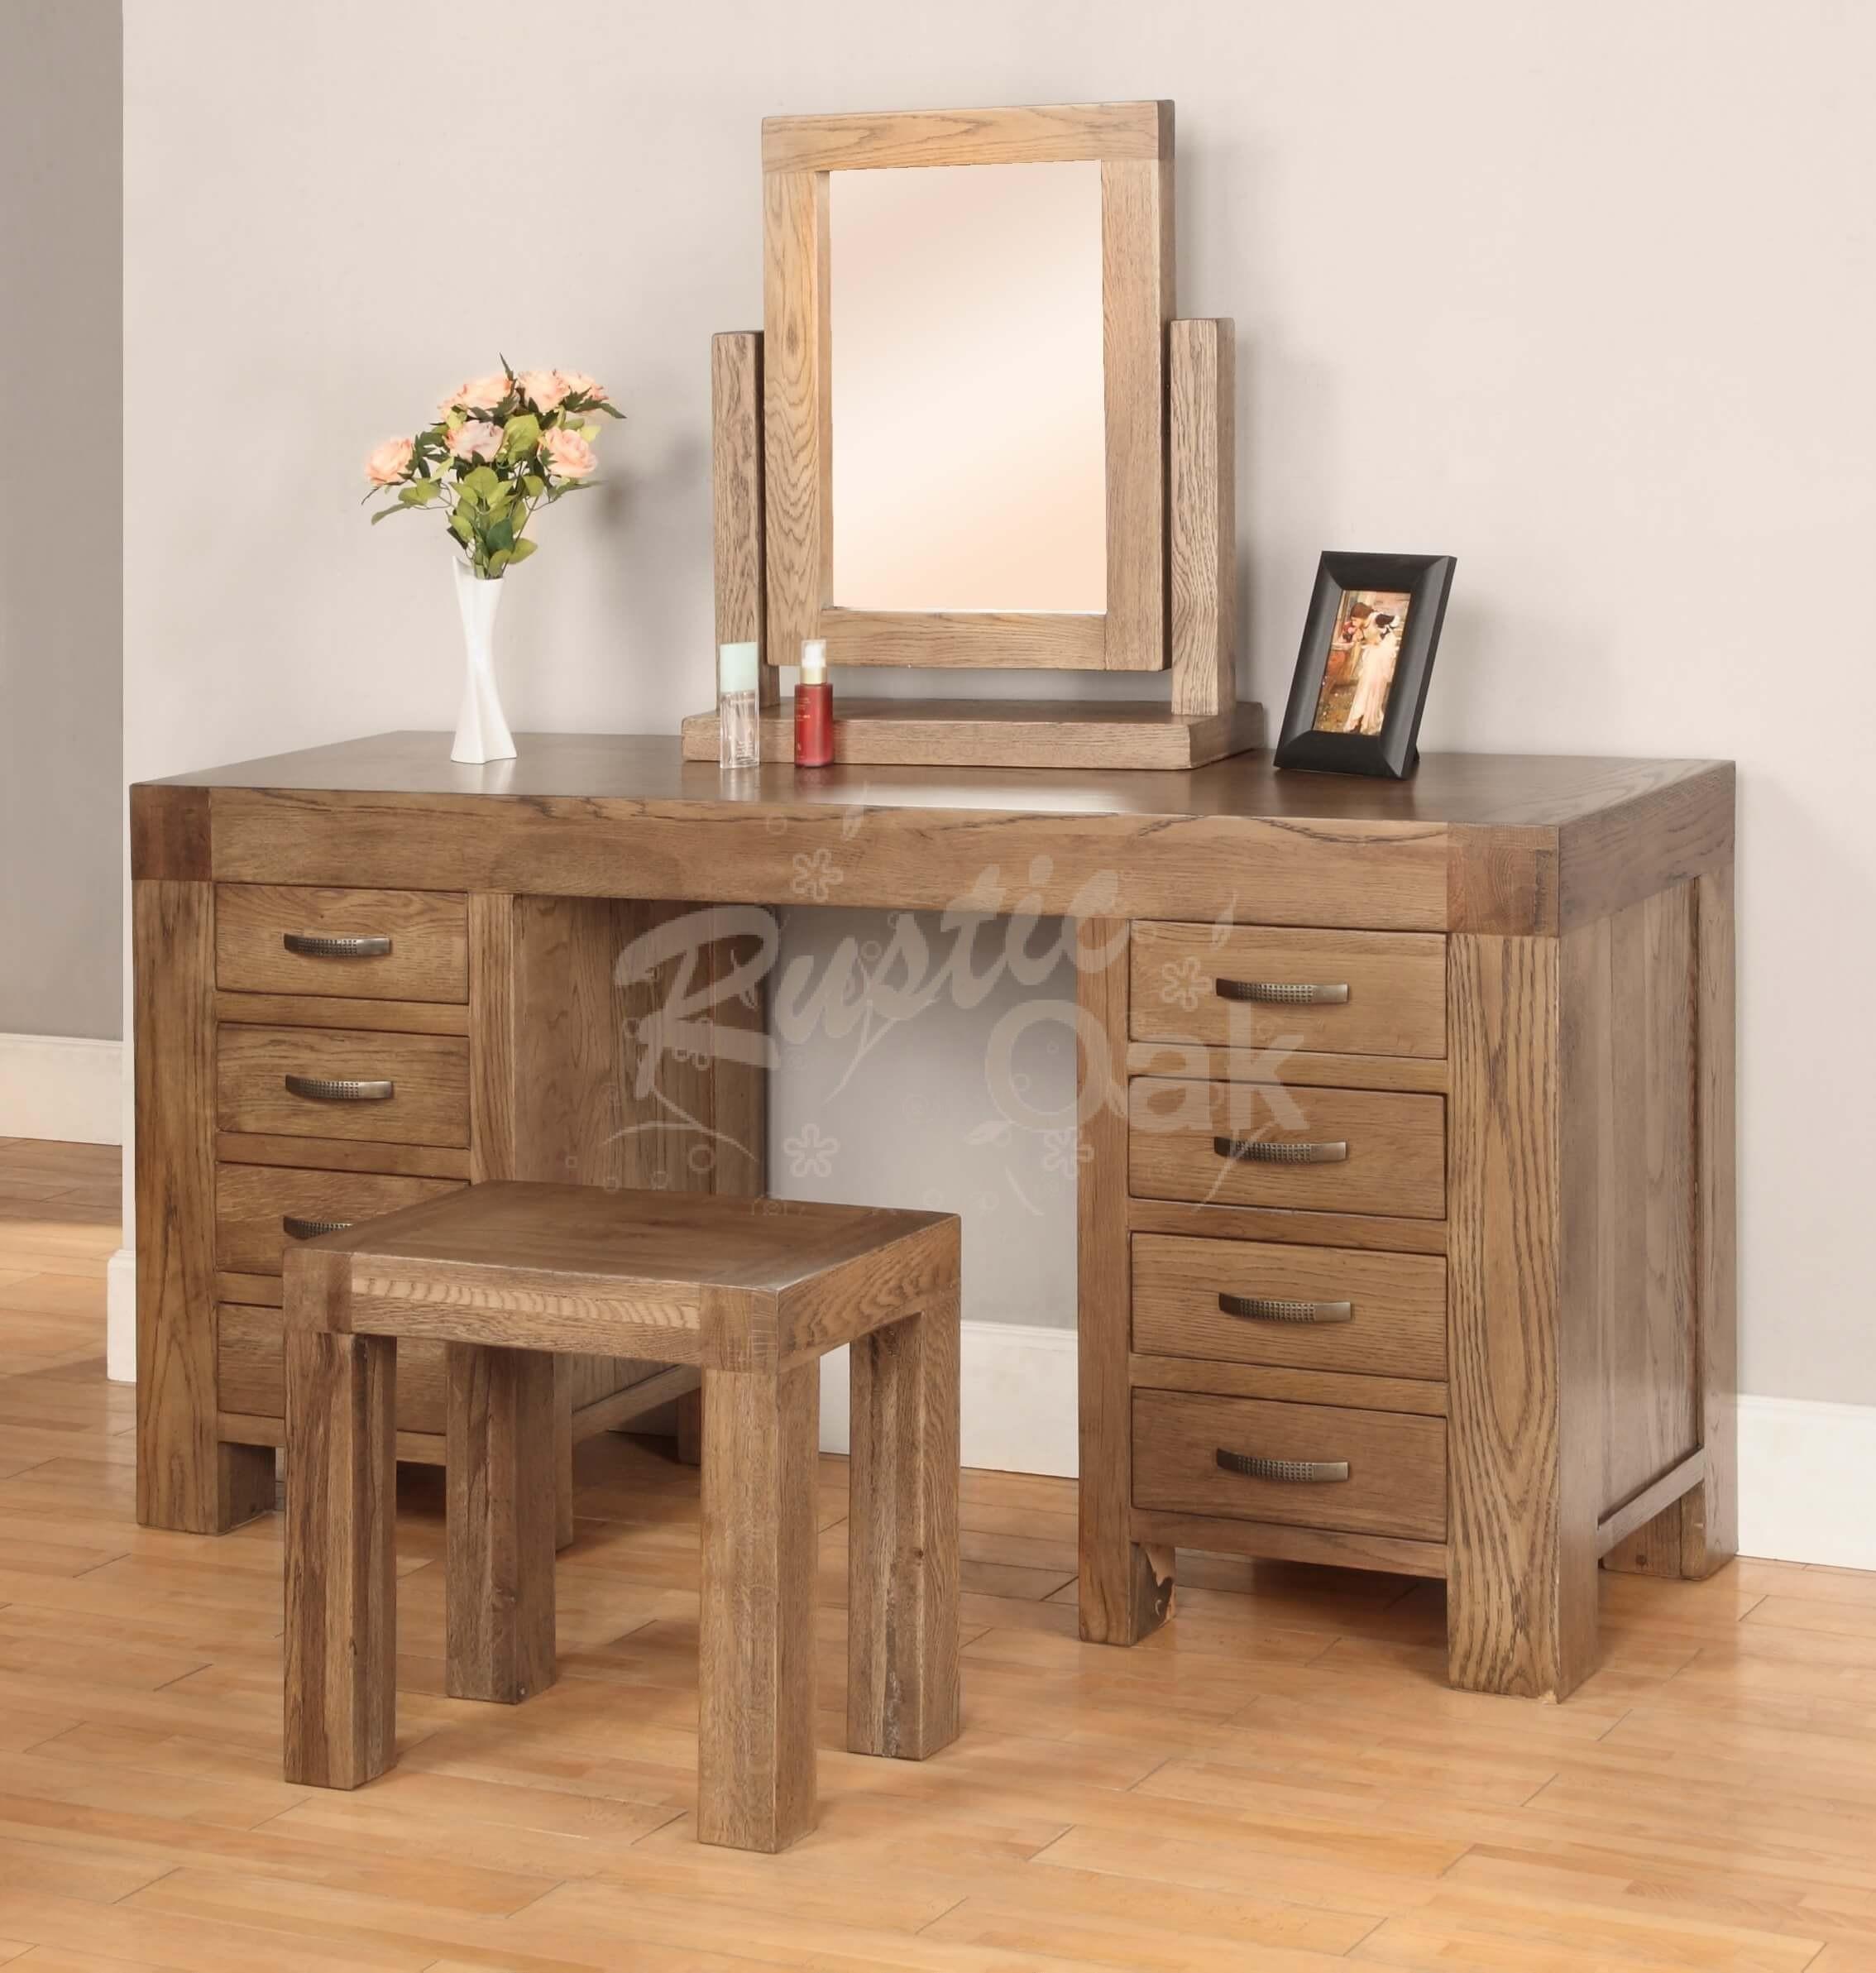 Dressing Tables Archives Rustic Oak